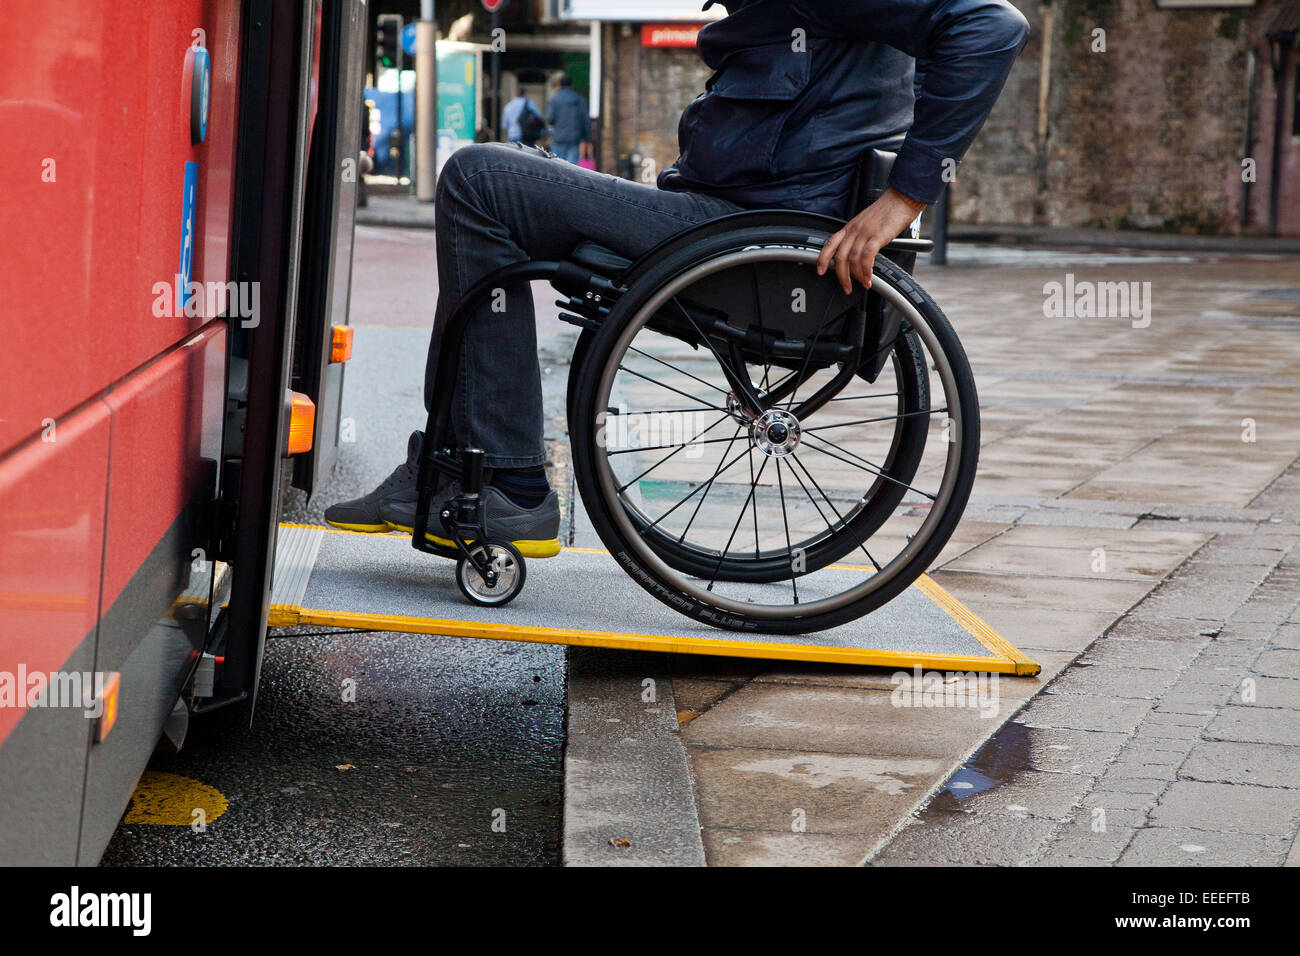 Wheelchair user boarding a London bus - Stock Image